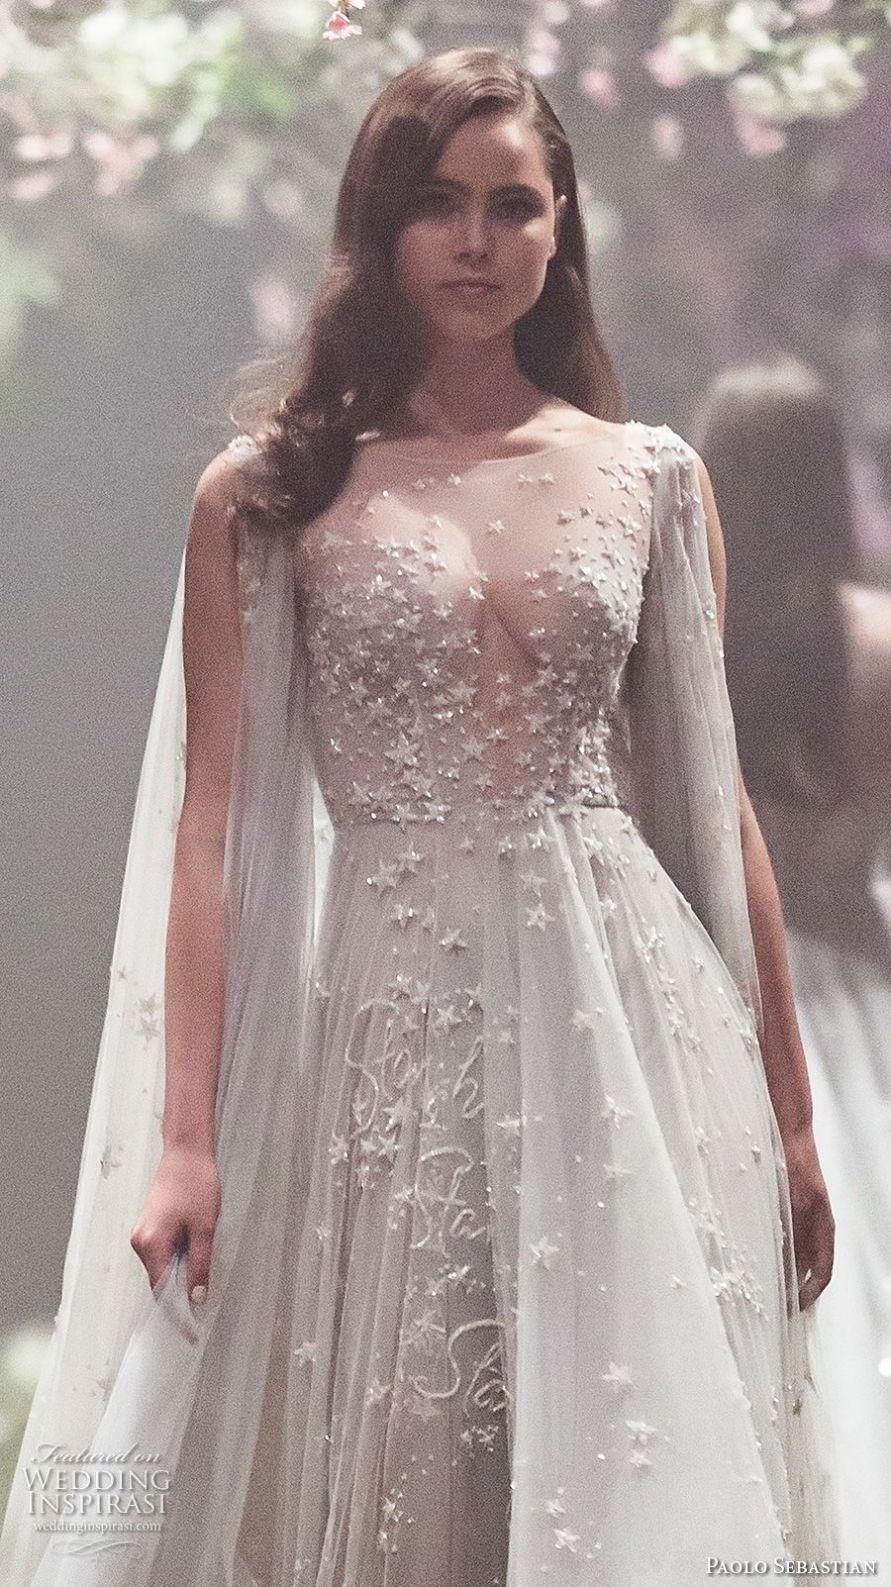 Paolo sebastian spring couture wedding dresses fashion